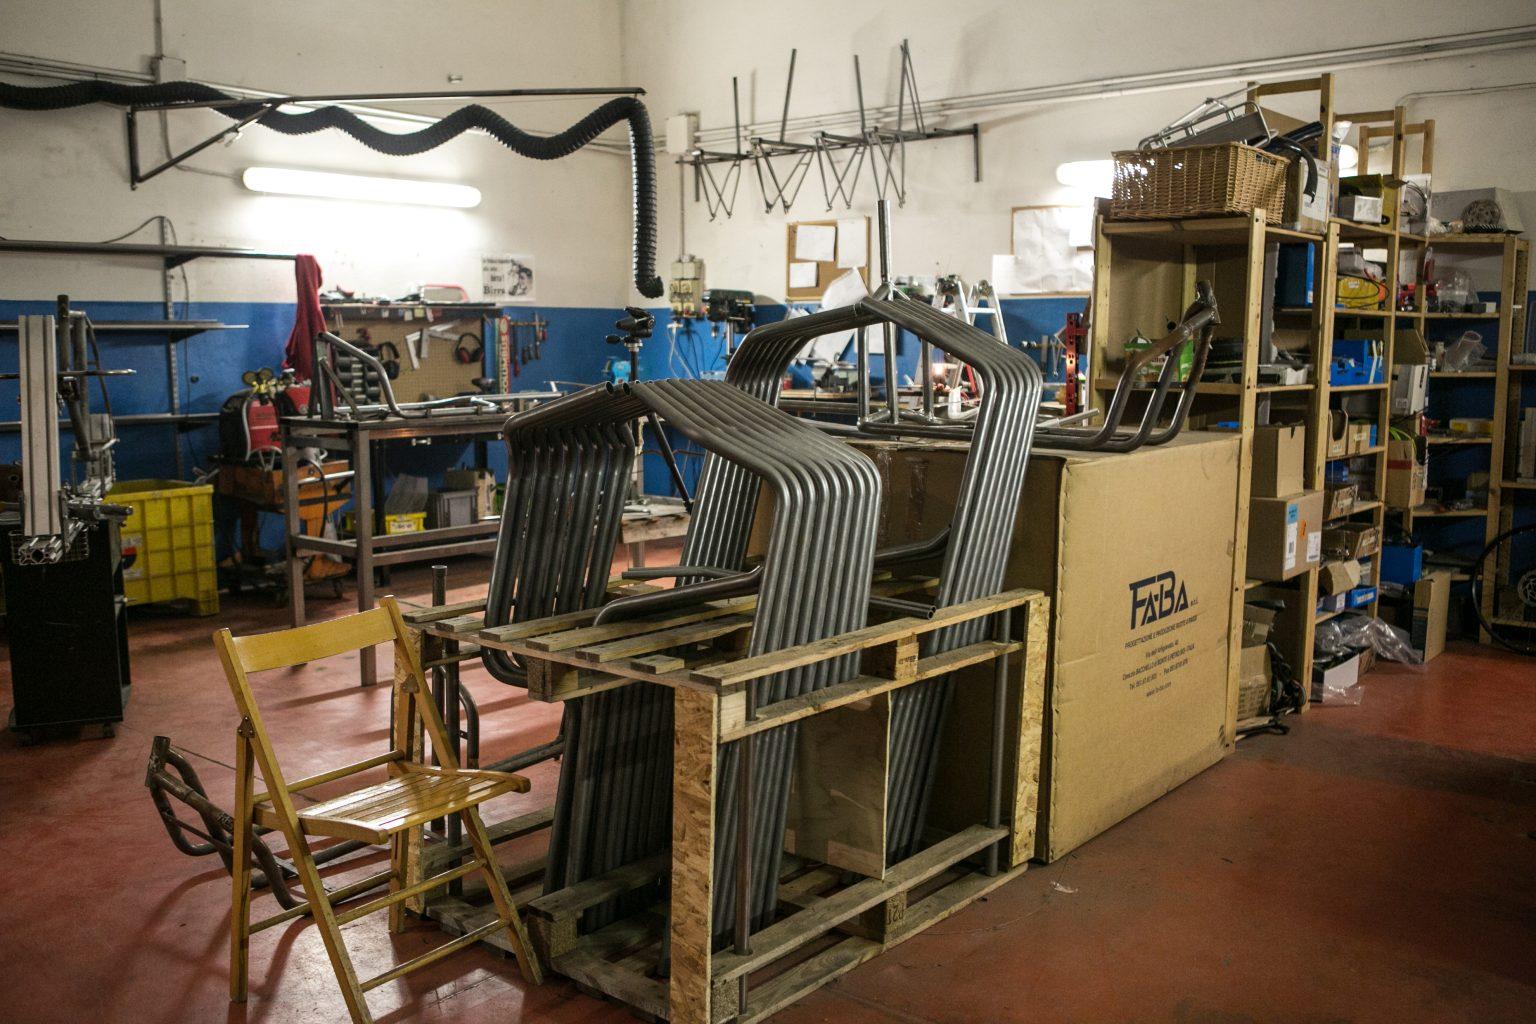 cargo bike officine recycle custom laboratorio workshop